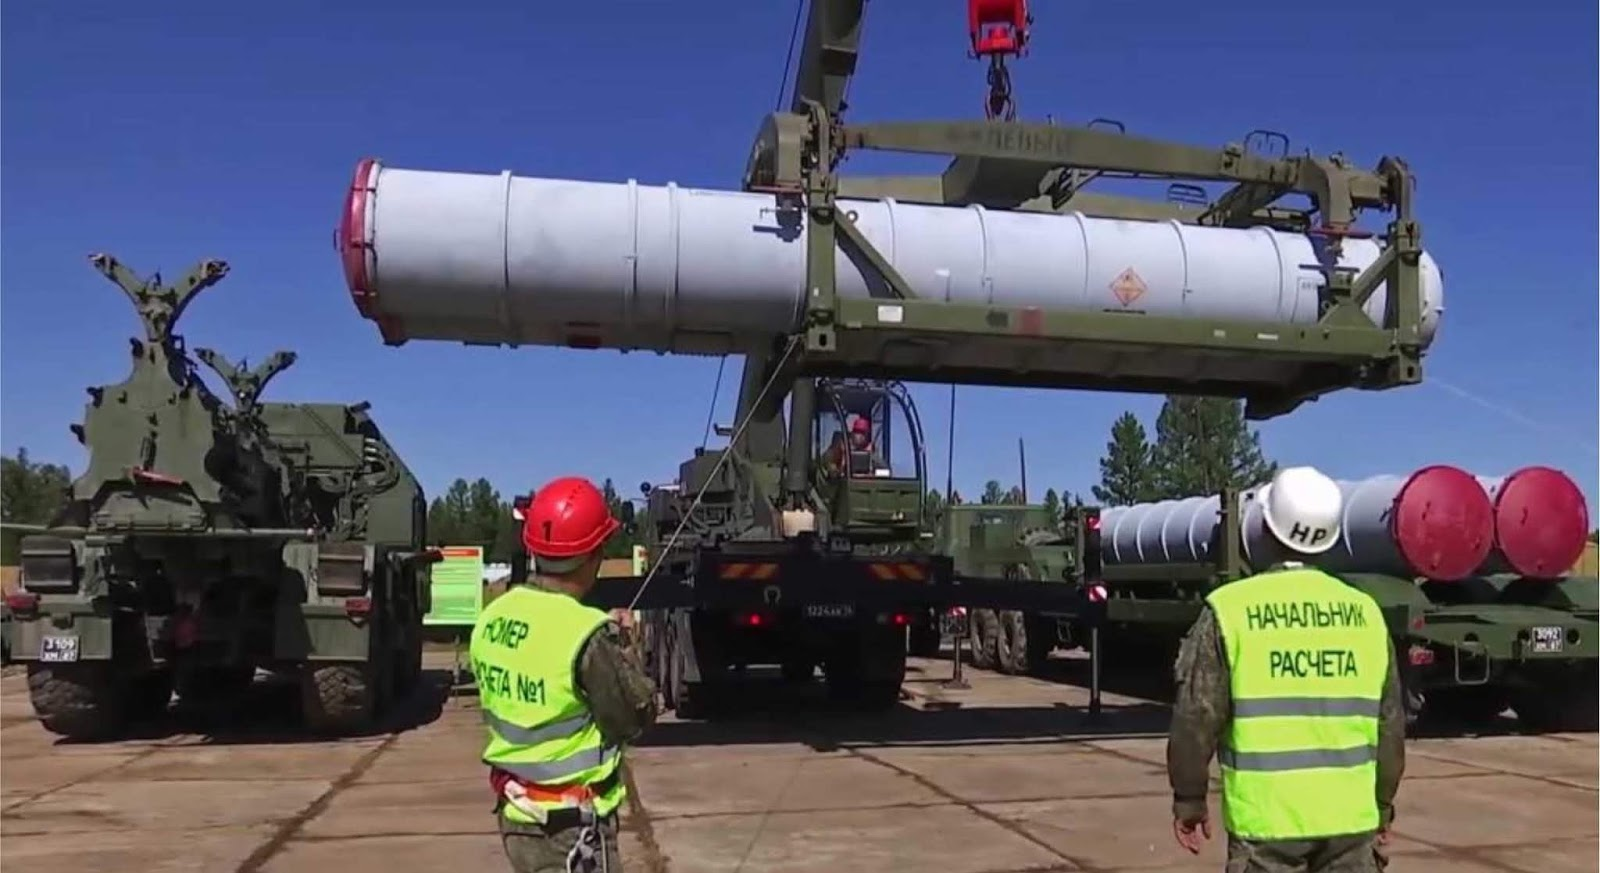 Turki dan Rusia tidak akan menggunakan dolar untuk kesepakatan S-400